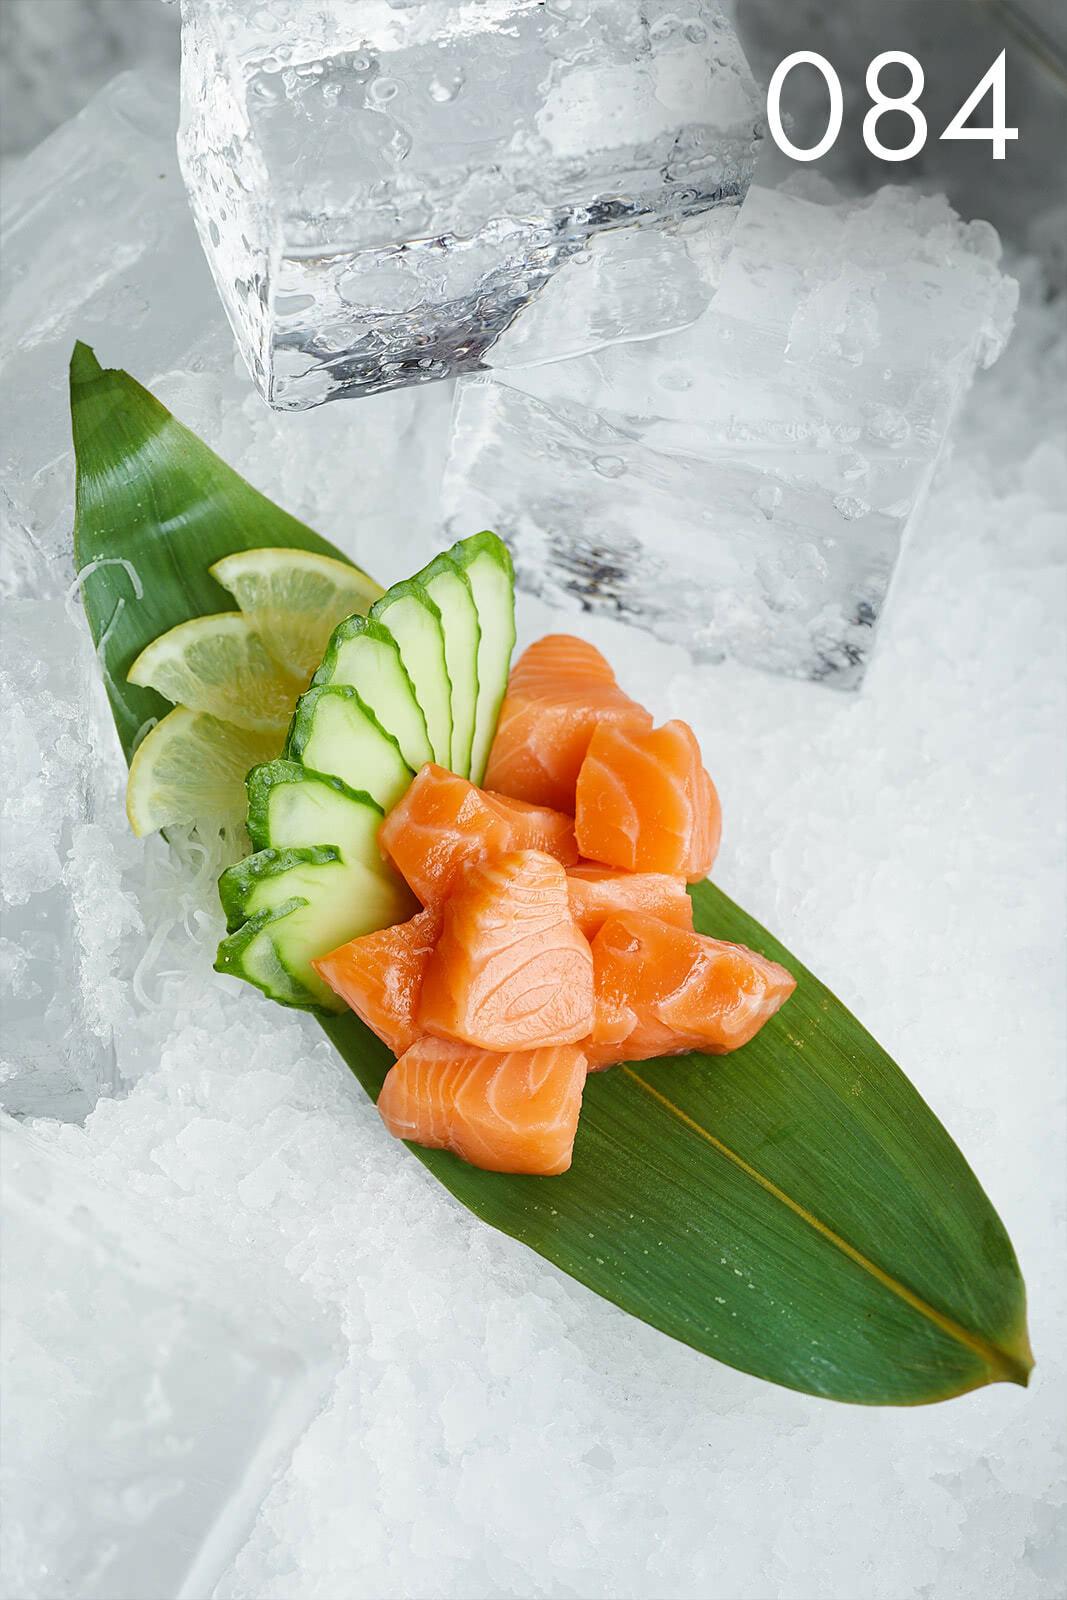 сашими с лососем в ресторане Веранда